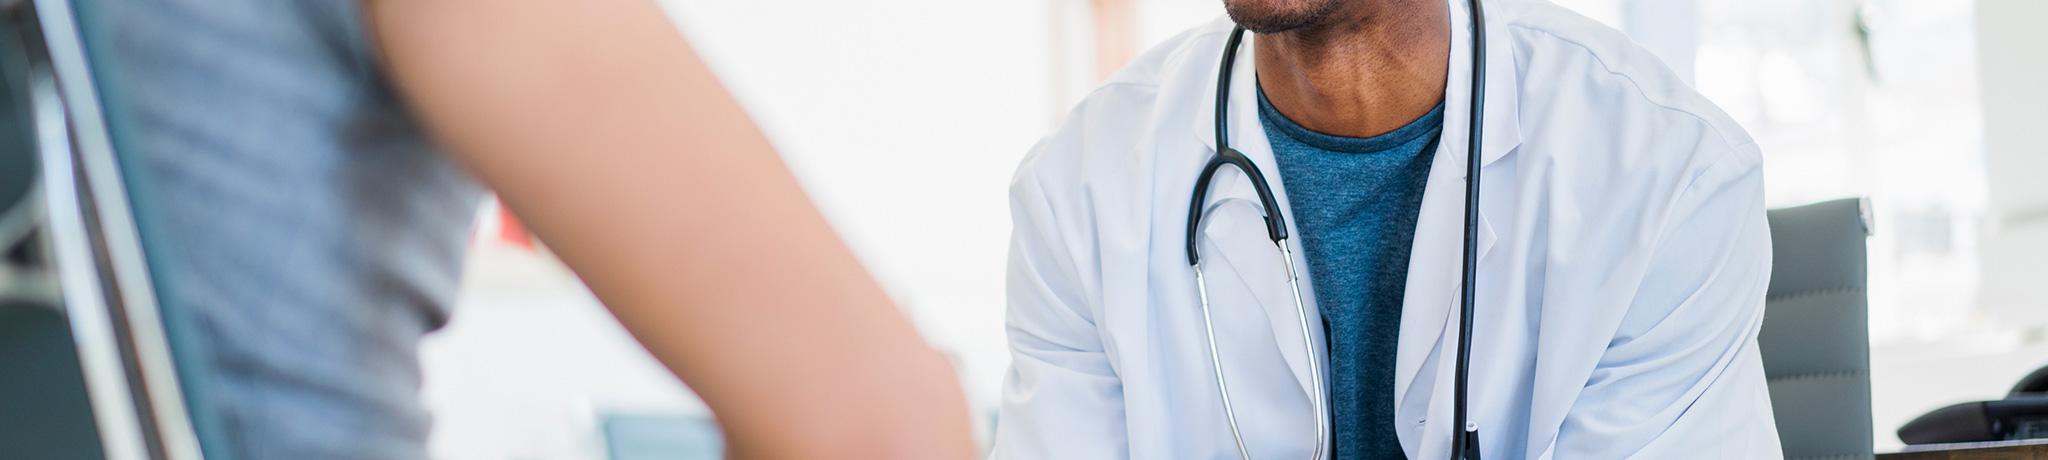 5969-110150 General Cardiology website - Web banners updates_R2_Desktop2